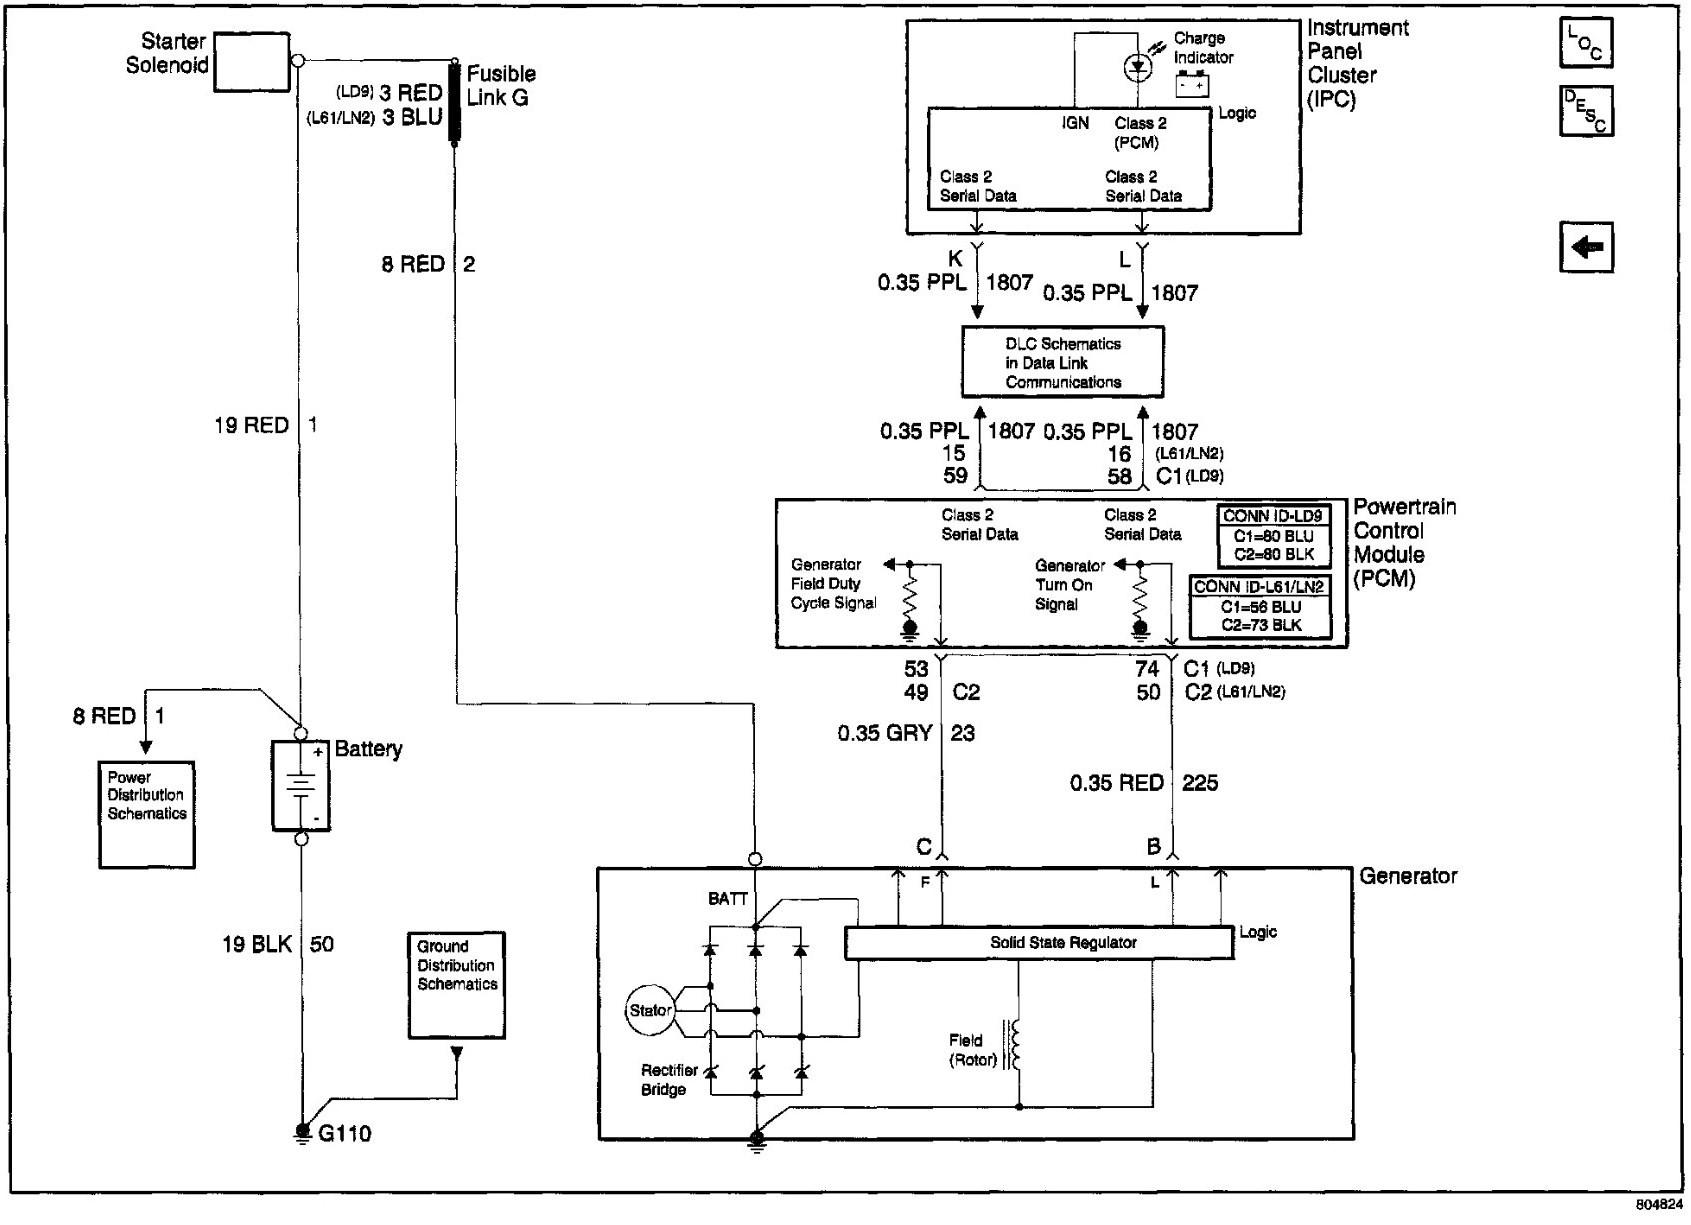 chevrolet volt system wiring diagram circuit diagram symbols u2022 rh stripgore com chevy volt wire diagram 2012 chevy volt wiring diagram